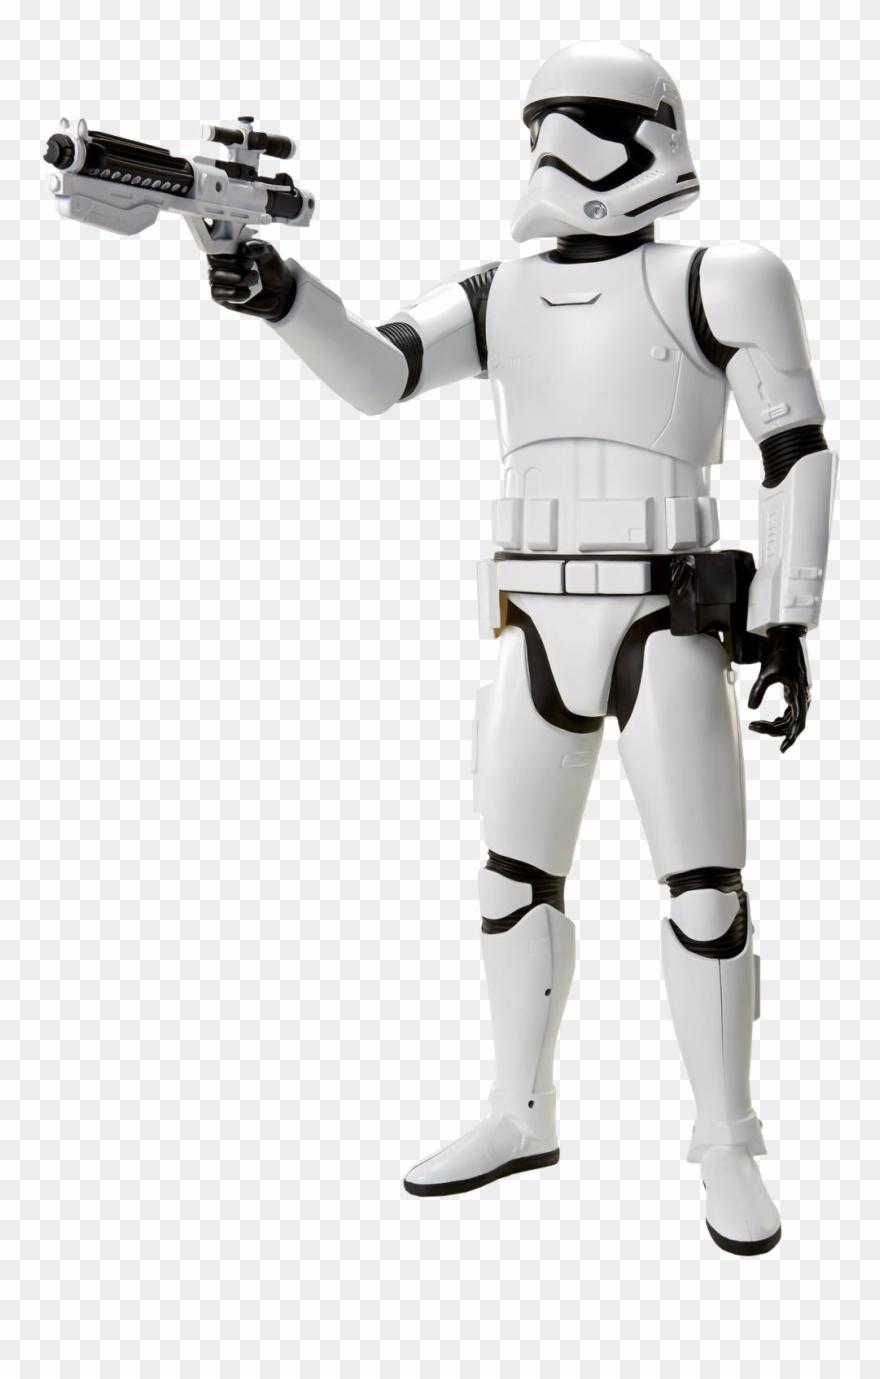 Star Wars Episode Vii The Force Awakens Figurine